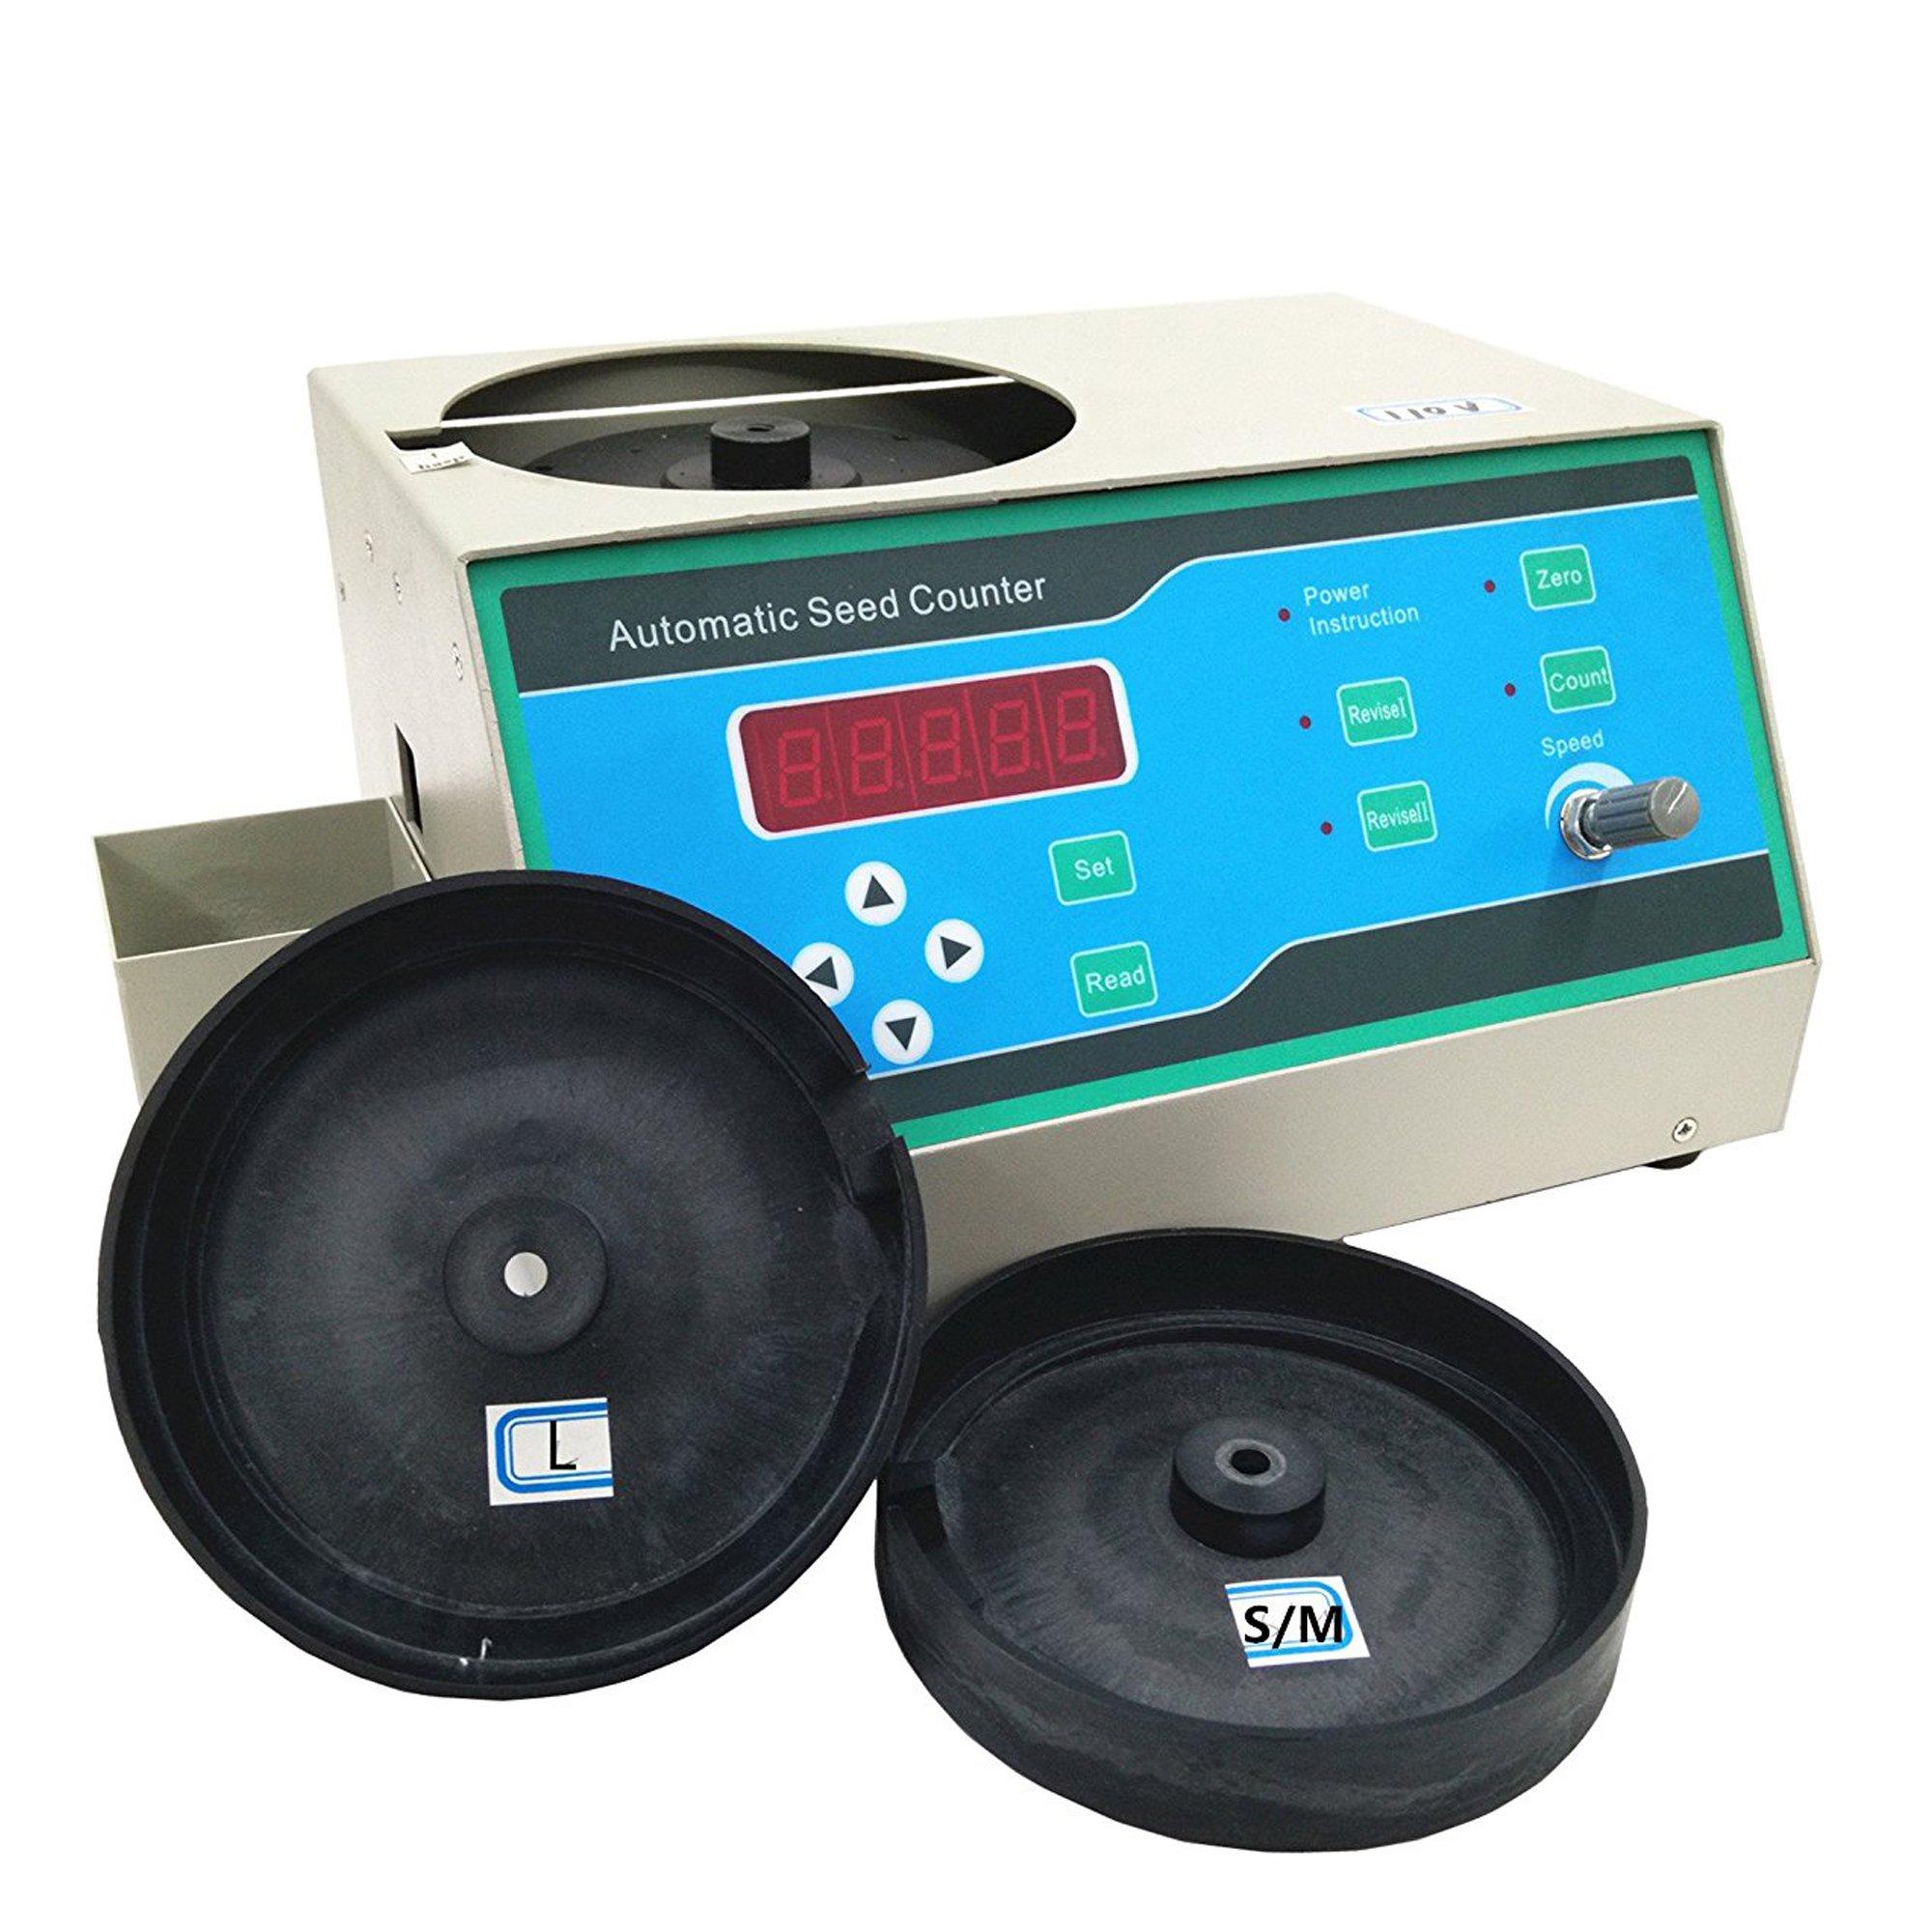 BAOSHISHAN Sly-C Automatic Seeds Counter Machine for S/M/L Shapes Seeds Like Wheat Rice Barley Corn110V/220V (110V)